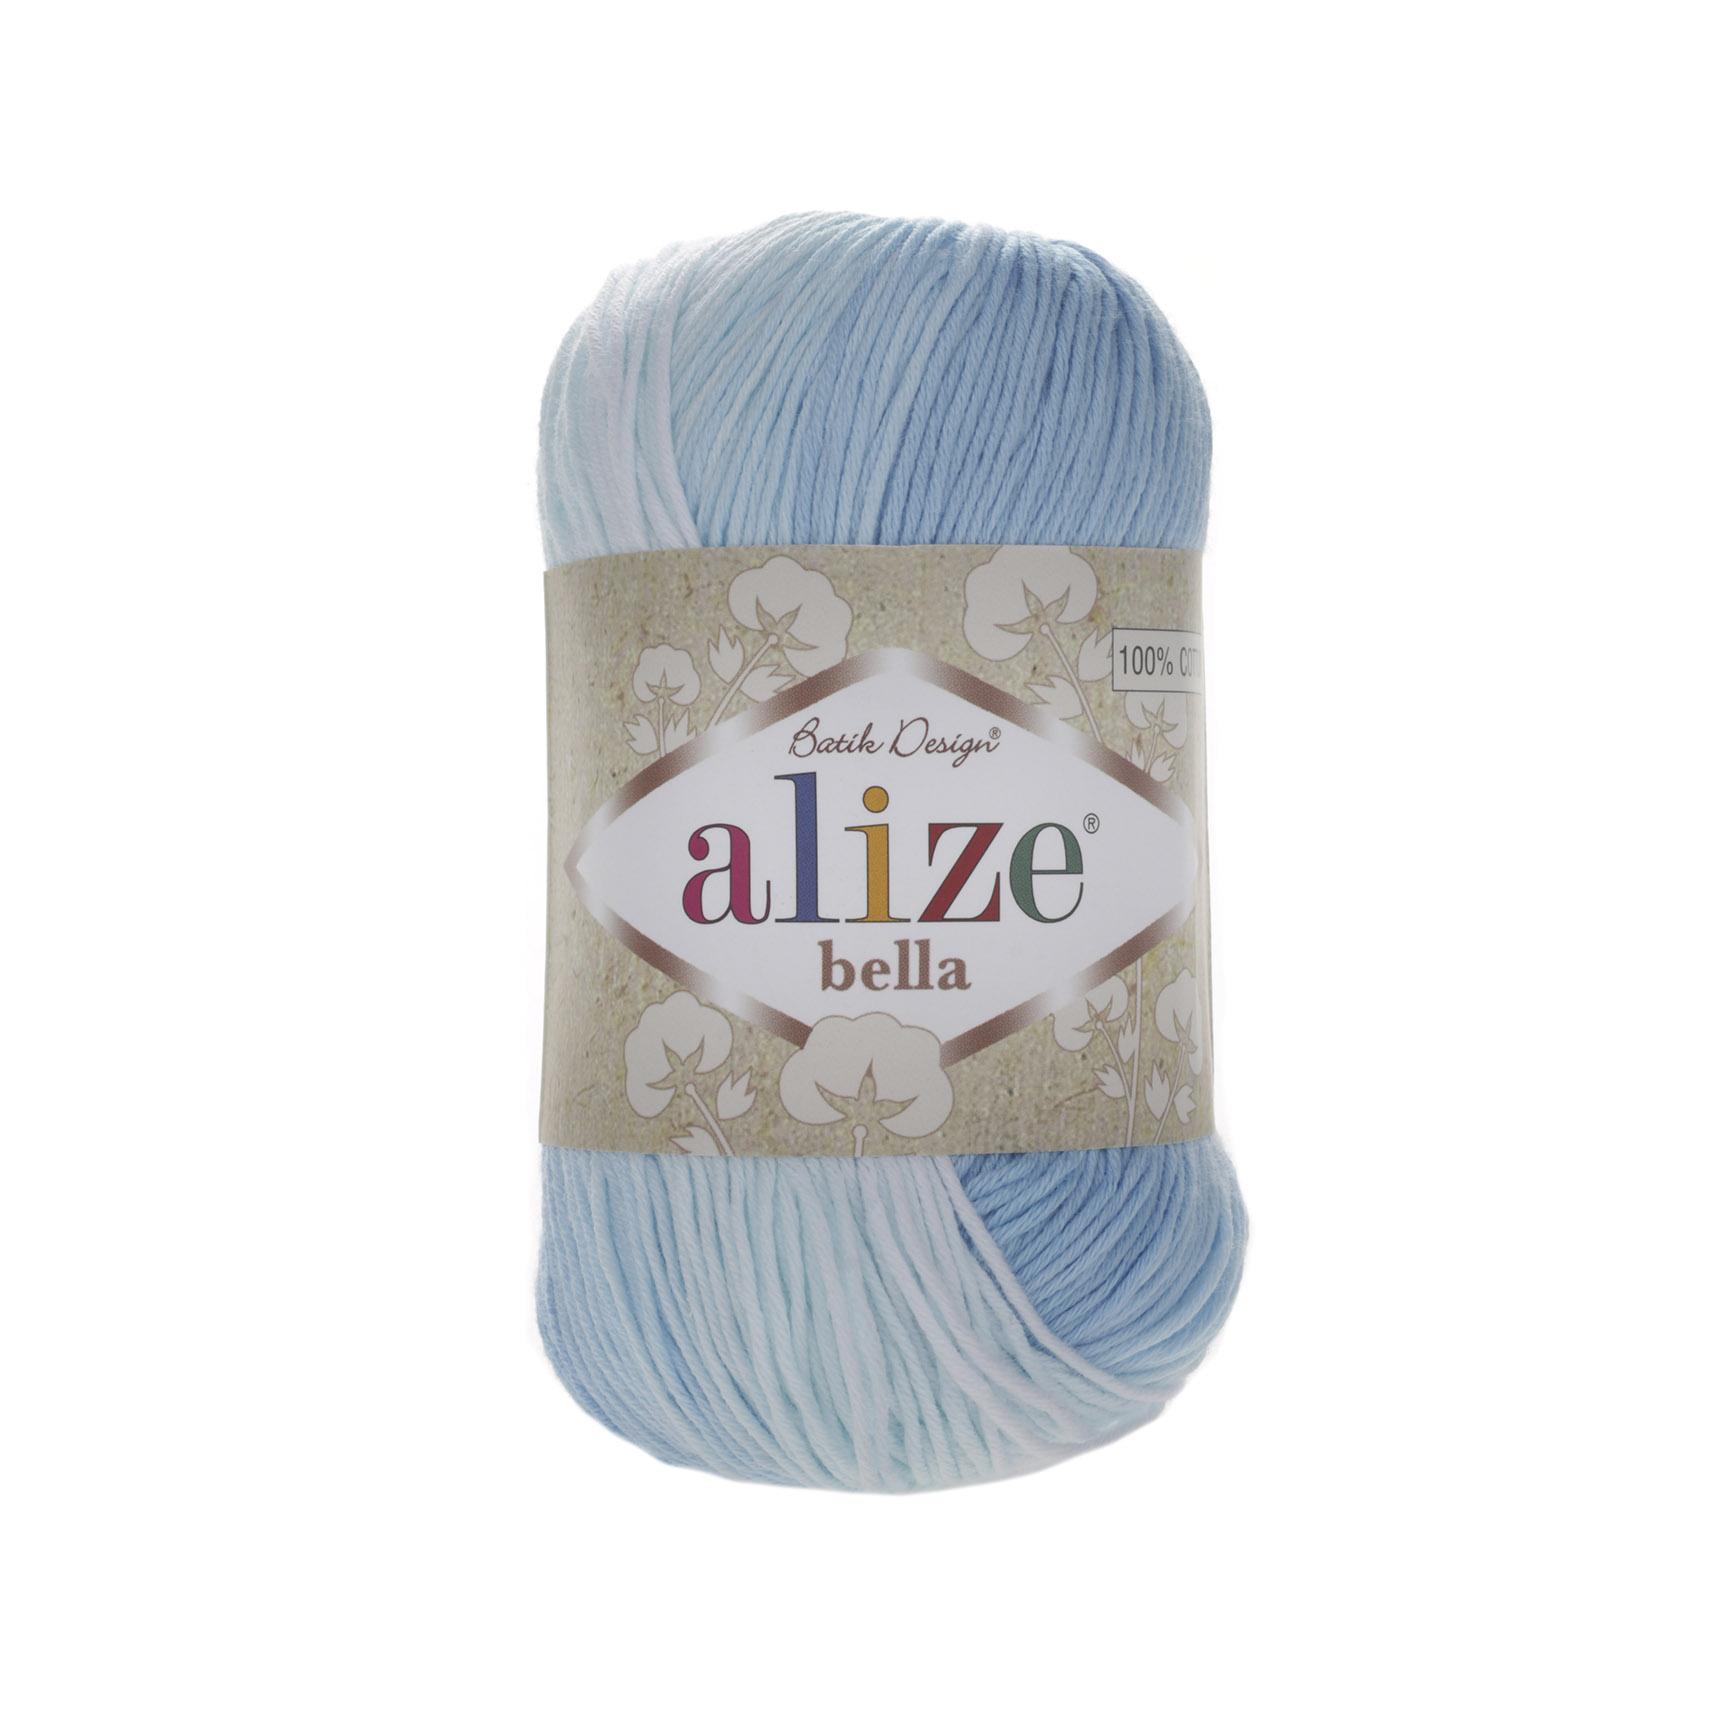 Bella batik - 100% bavlna